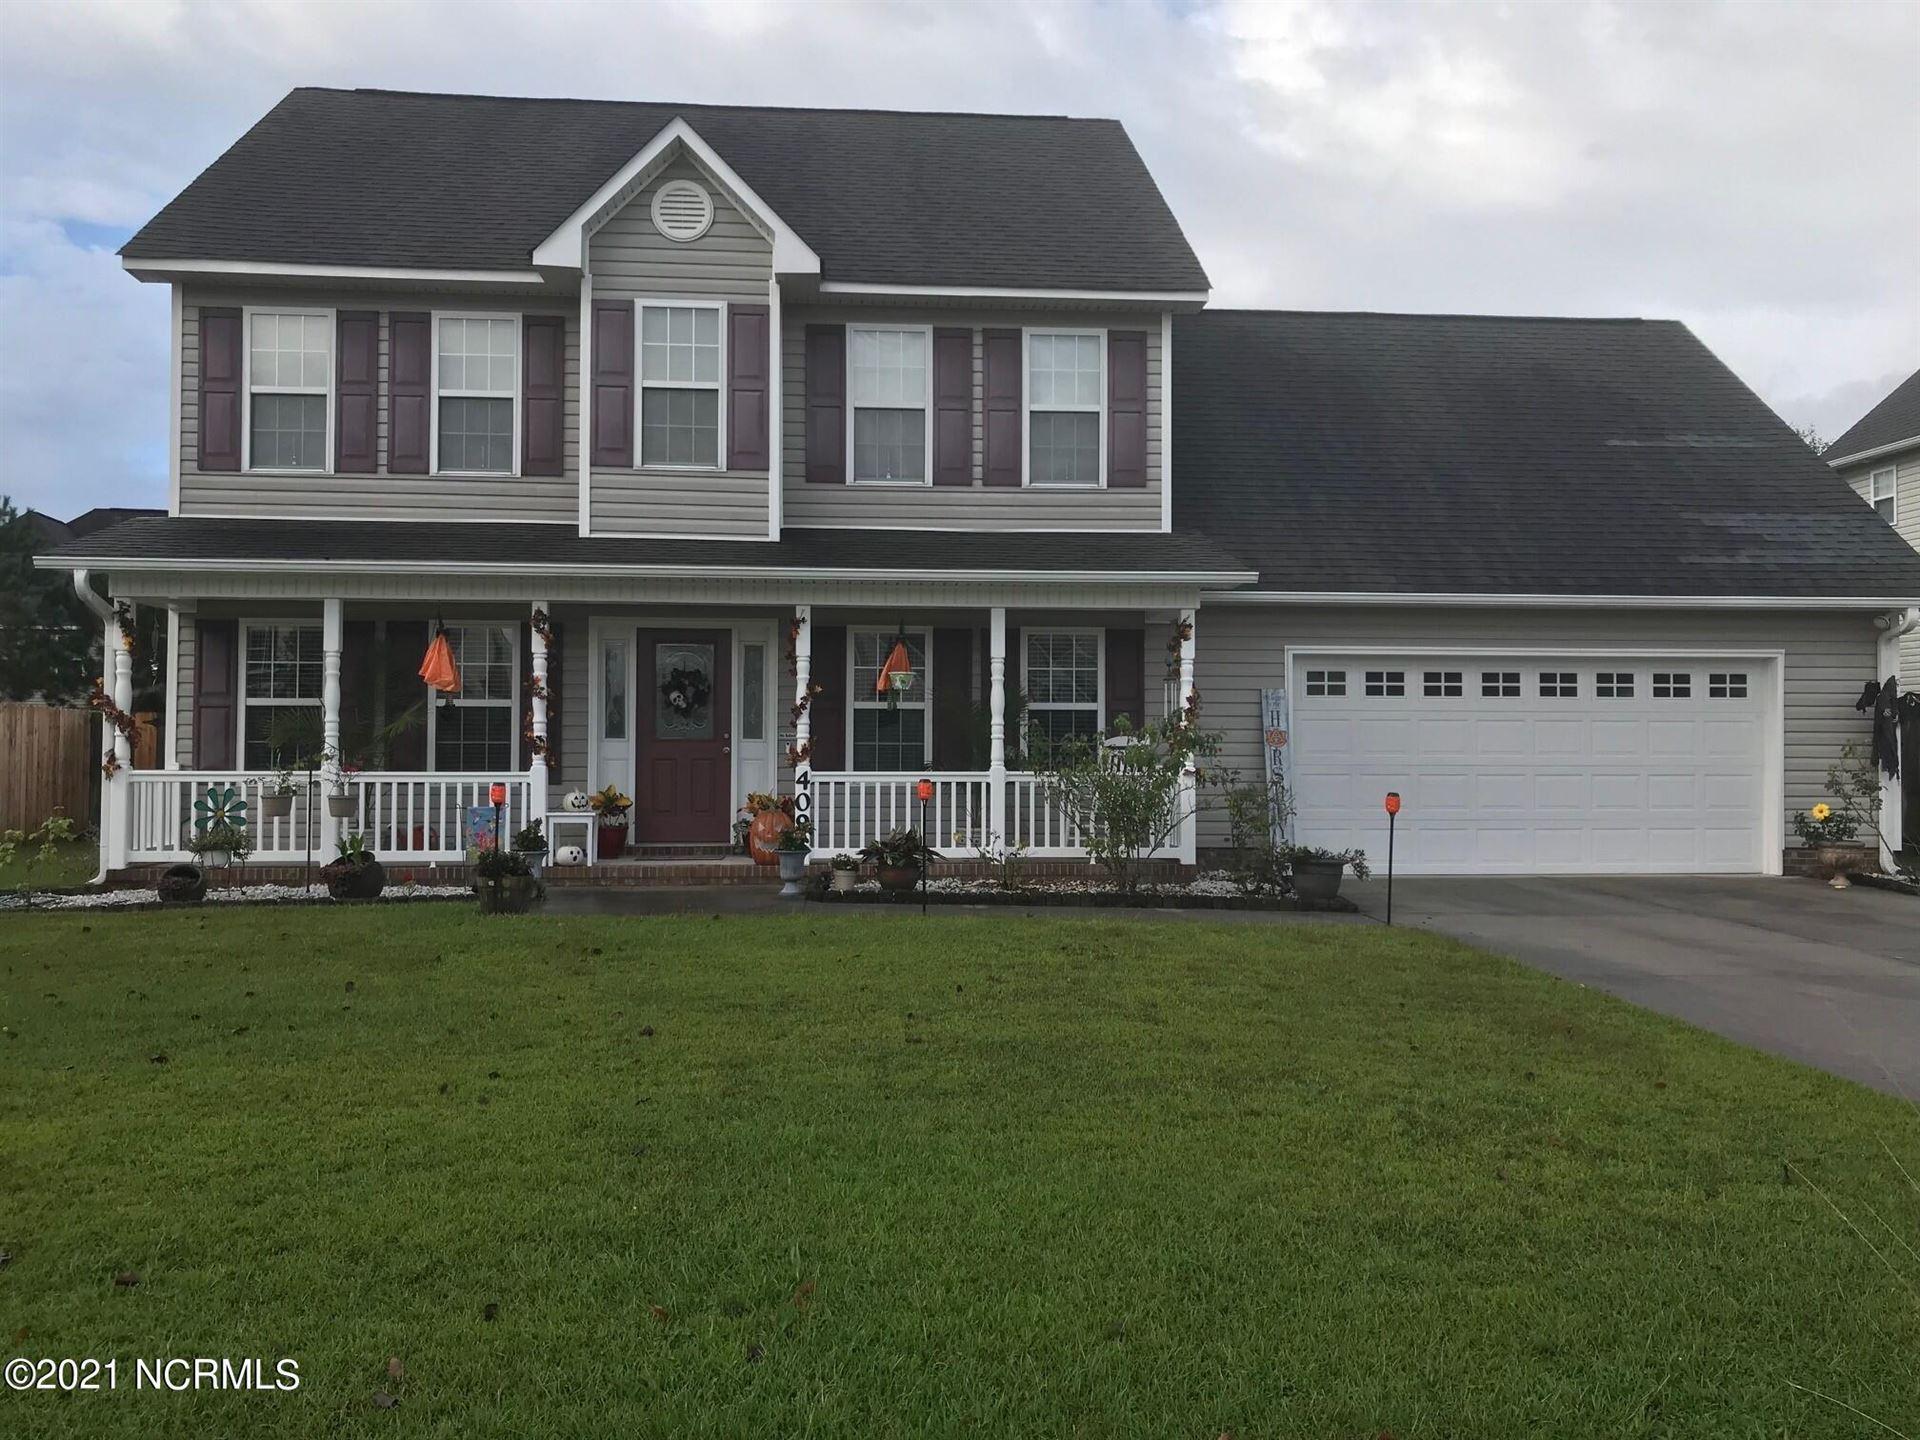 Photo of 409 Brunswick Drive, Jacksonville, NC 28546 (MLS # 100291981)